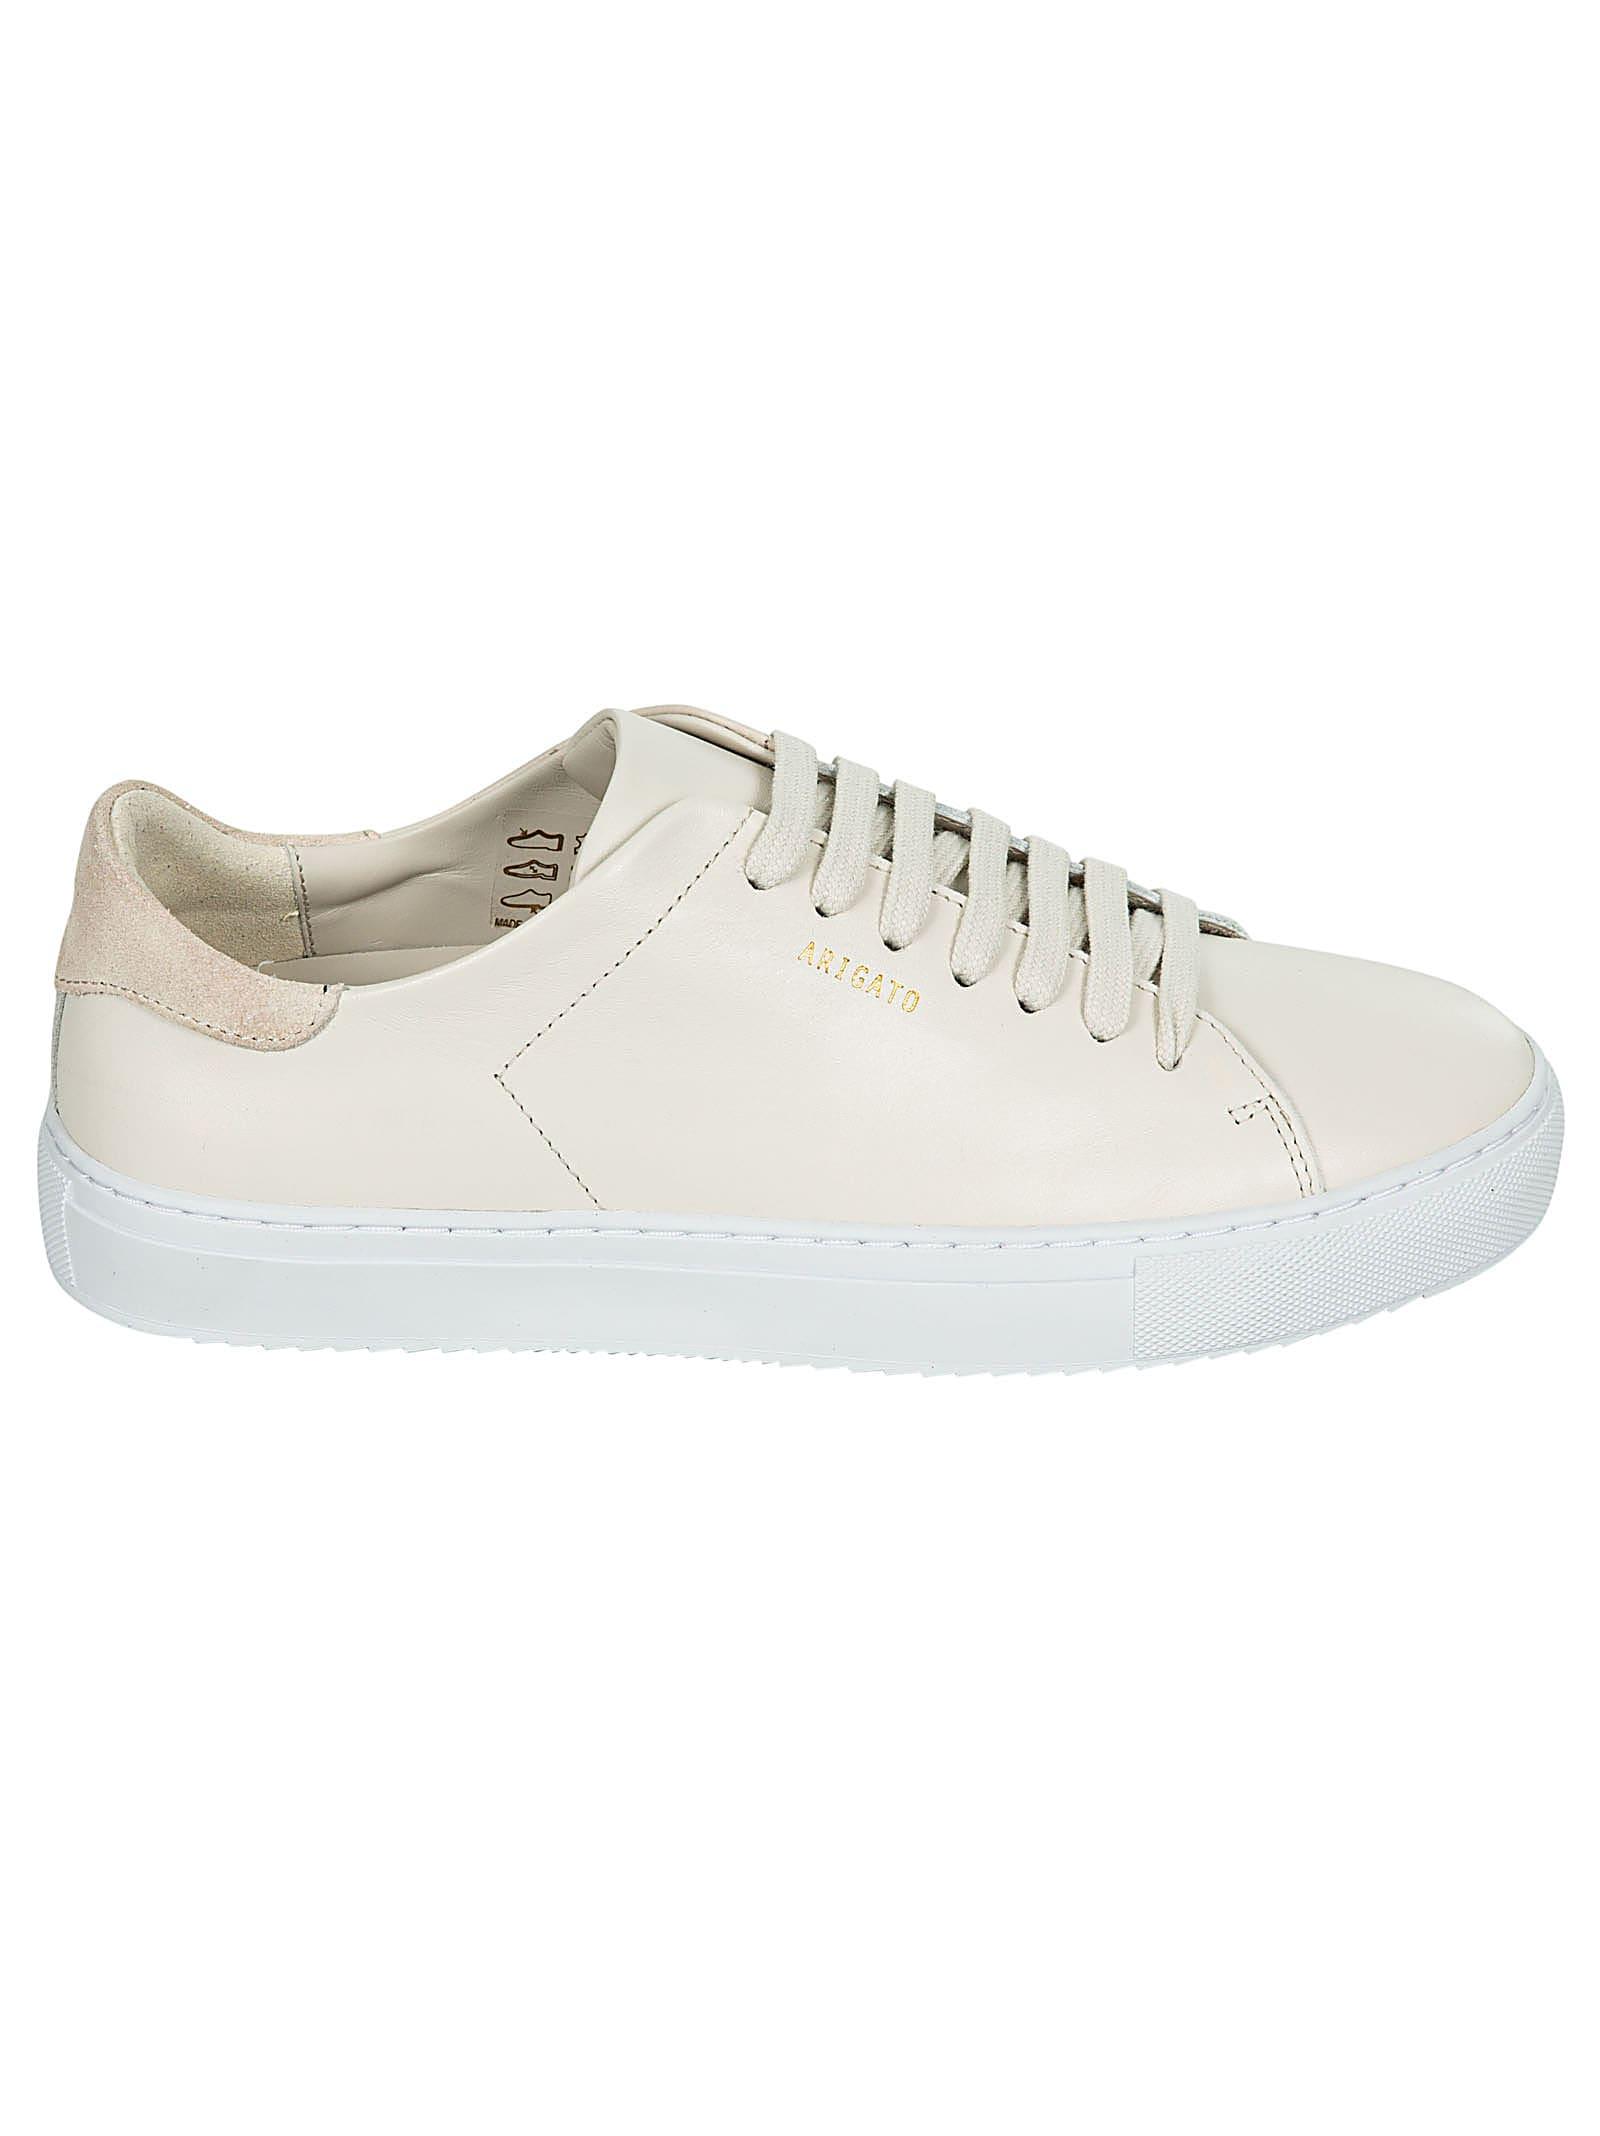 Axel Arigato Logo Sneakers In Off White